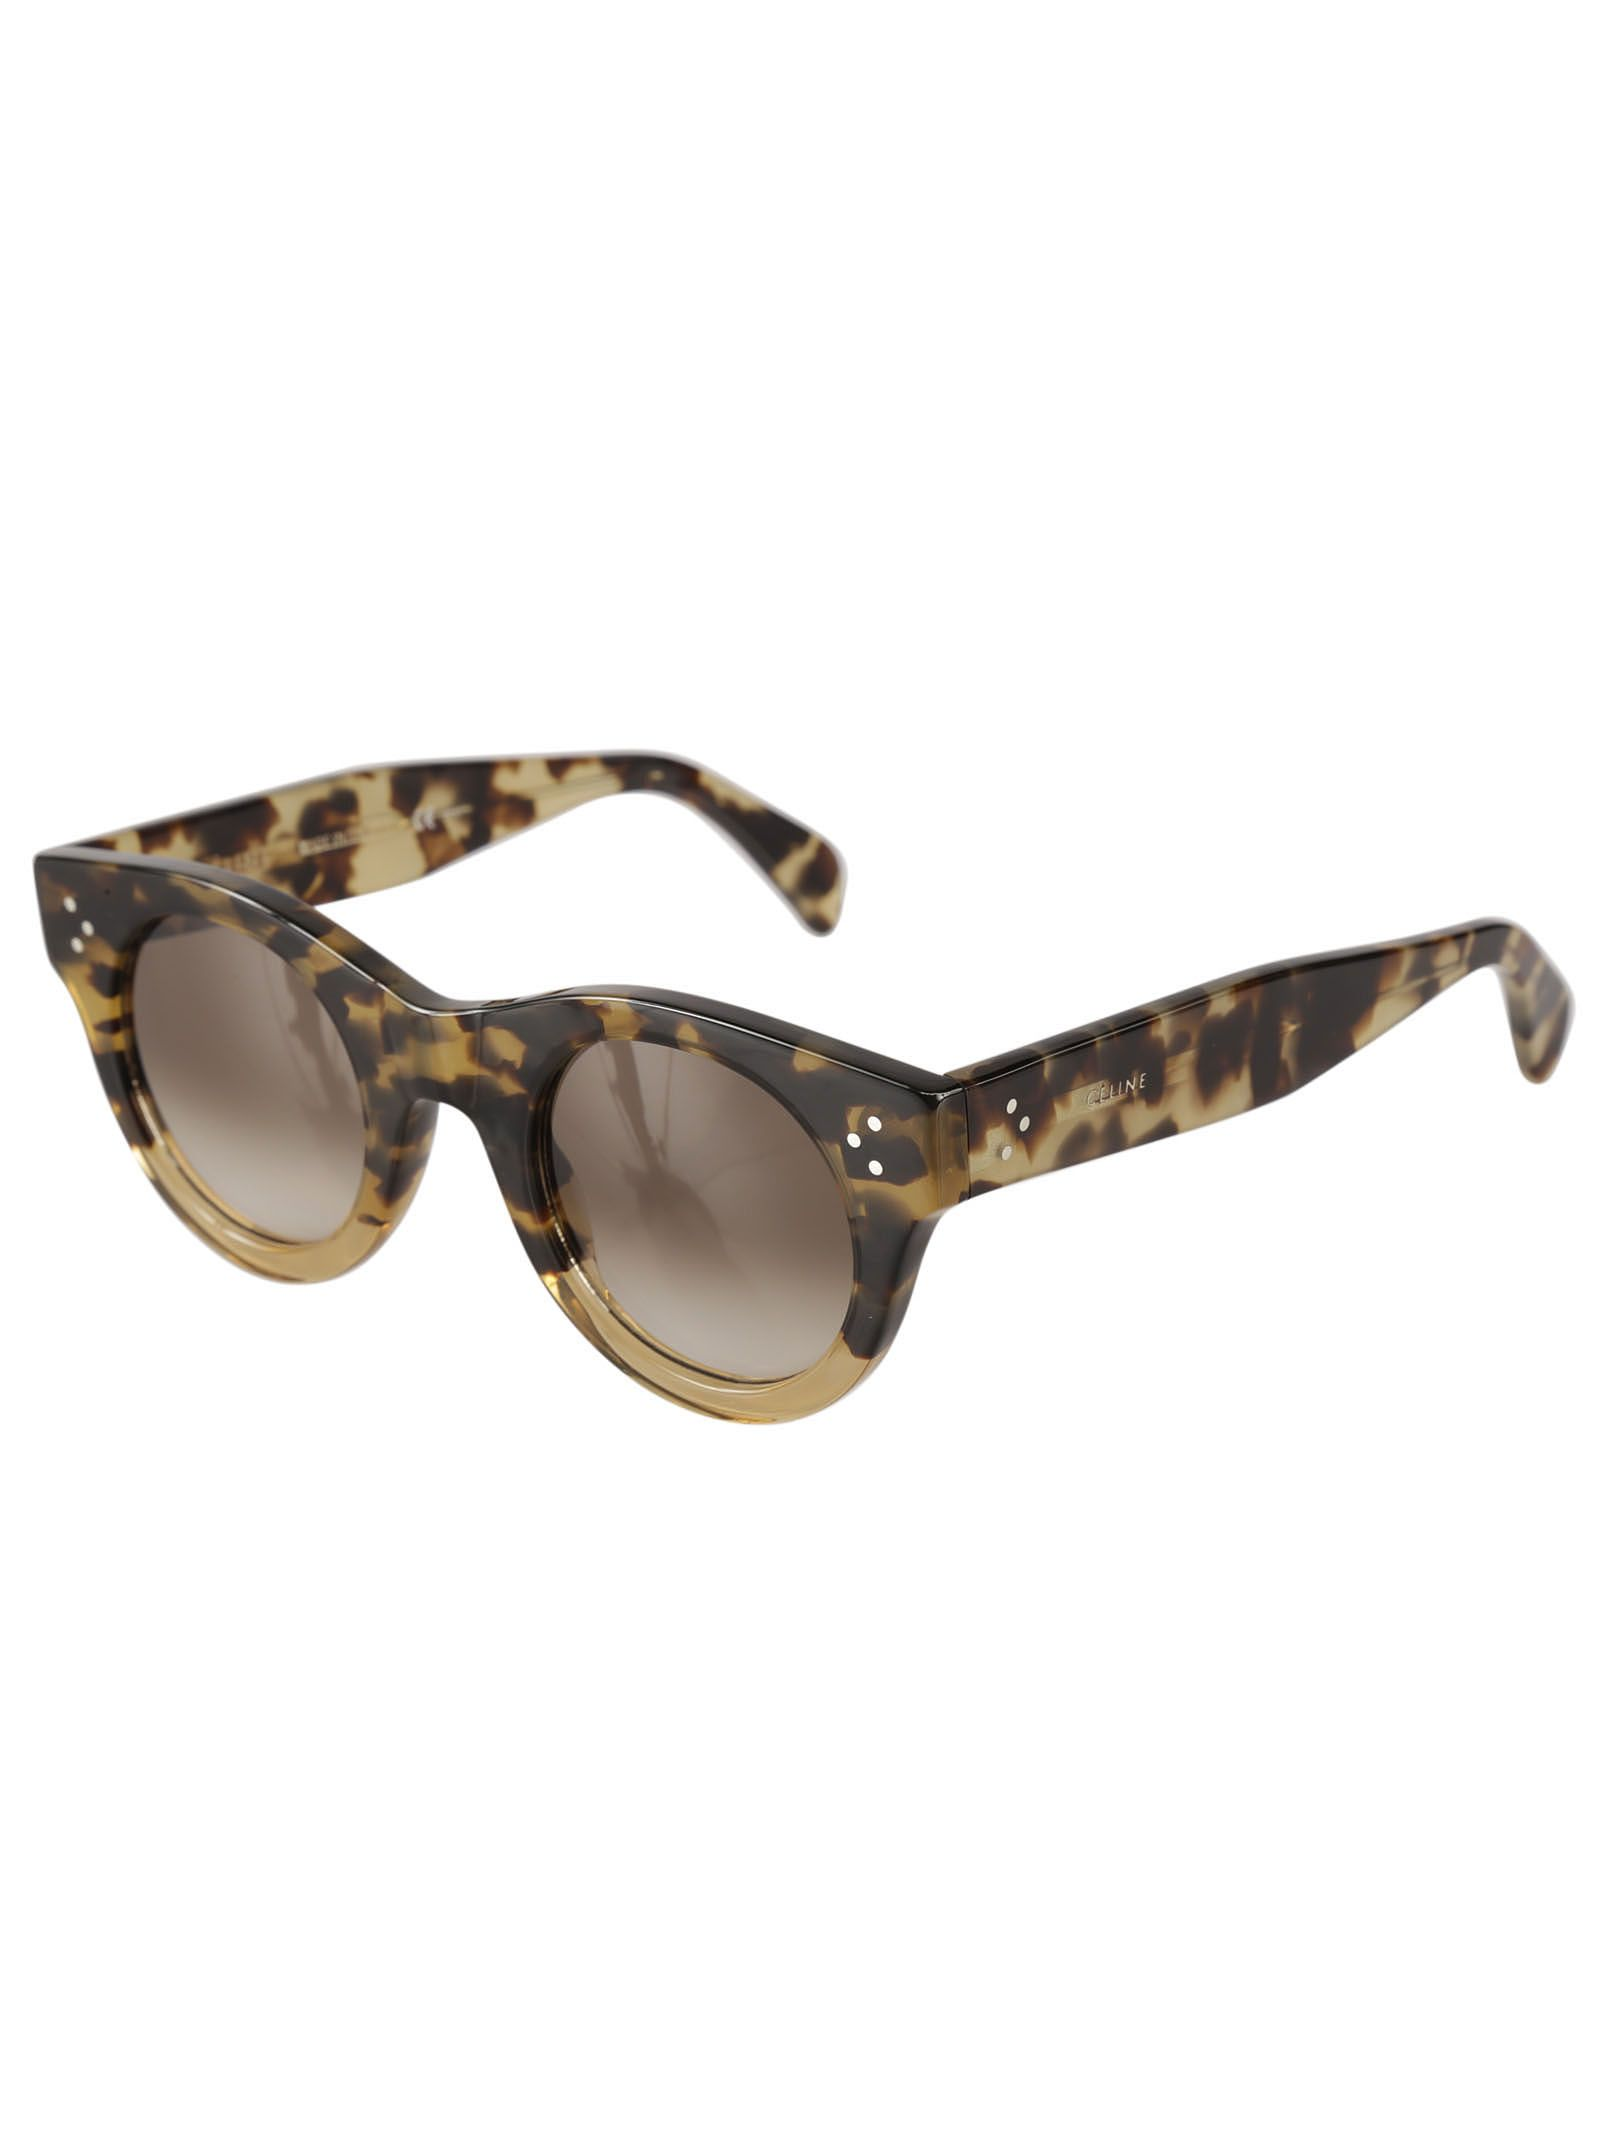 62a1f94d9f571 Celine Sunglasses Optical